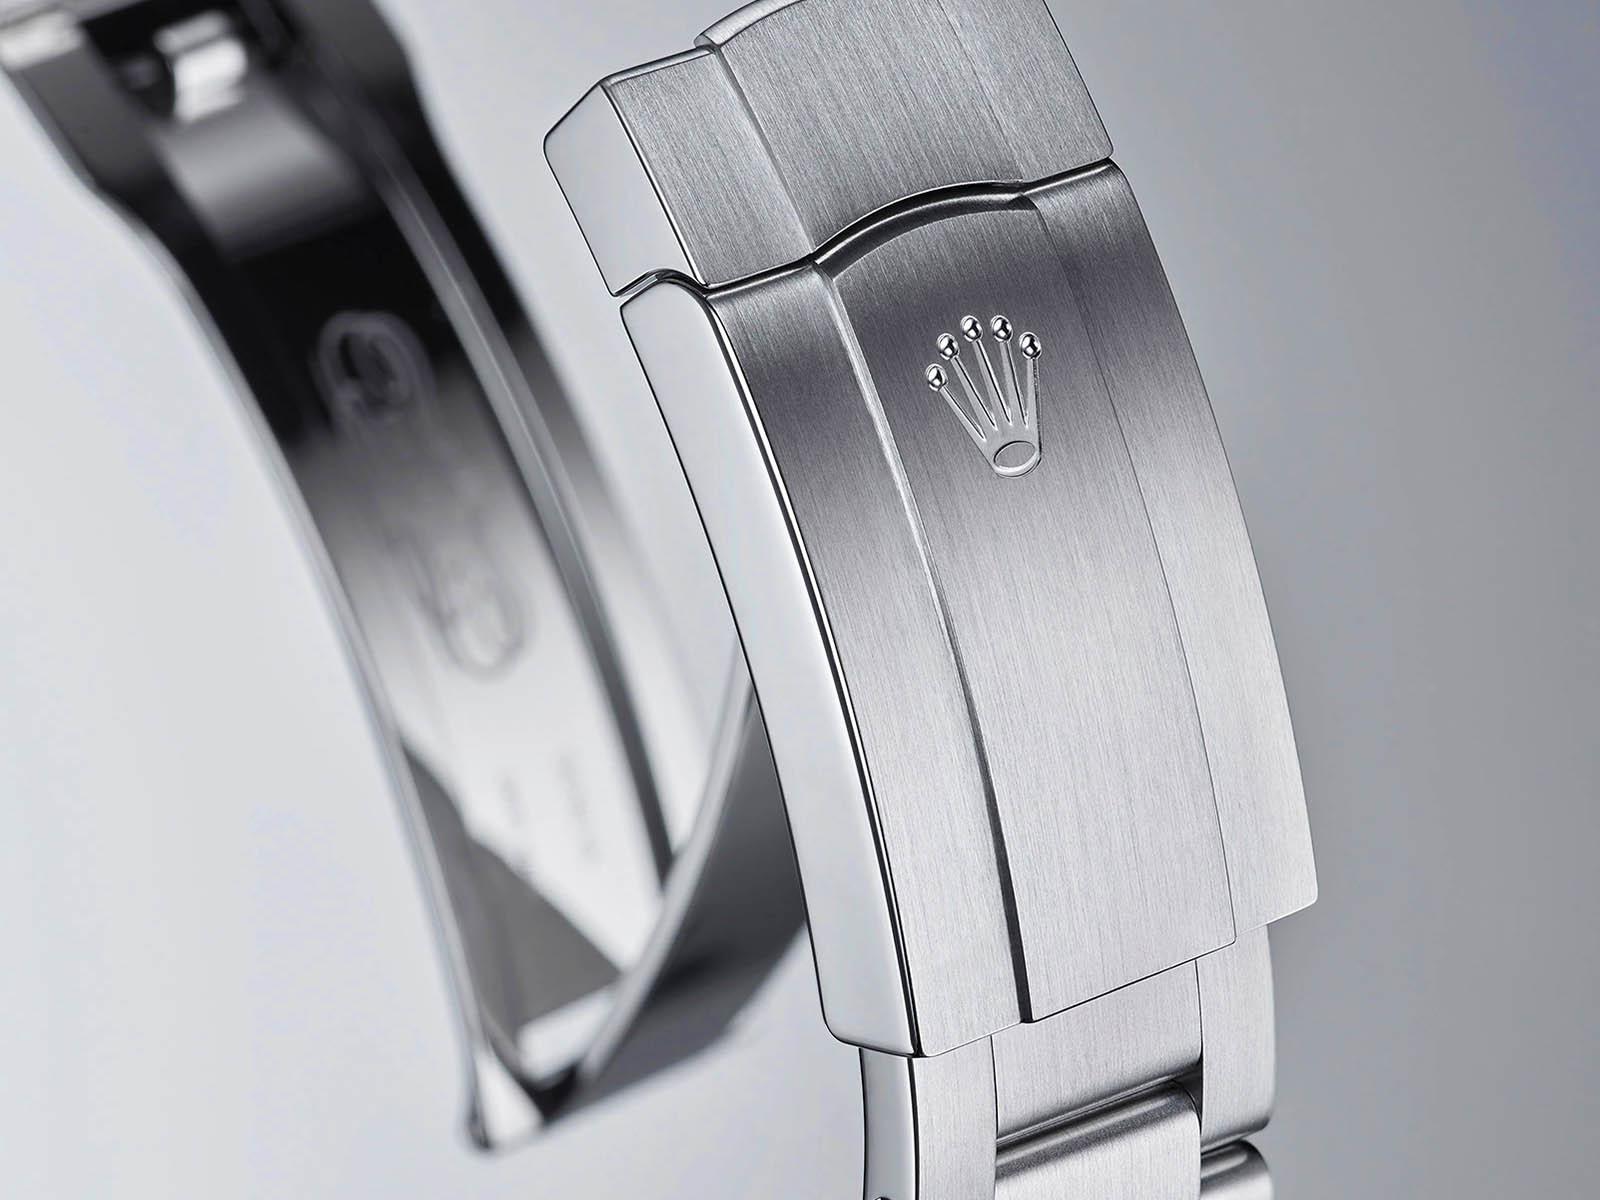 rolex-bracelets-and-straps-3.jpg